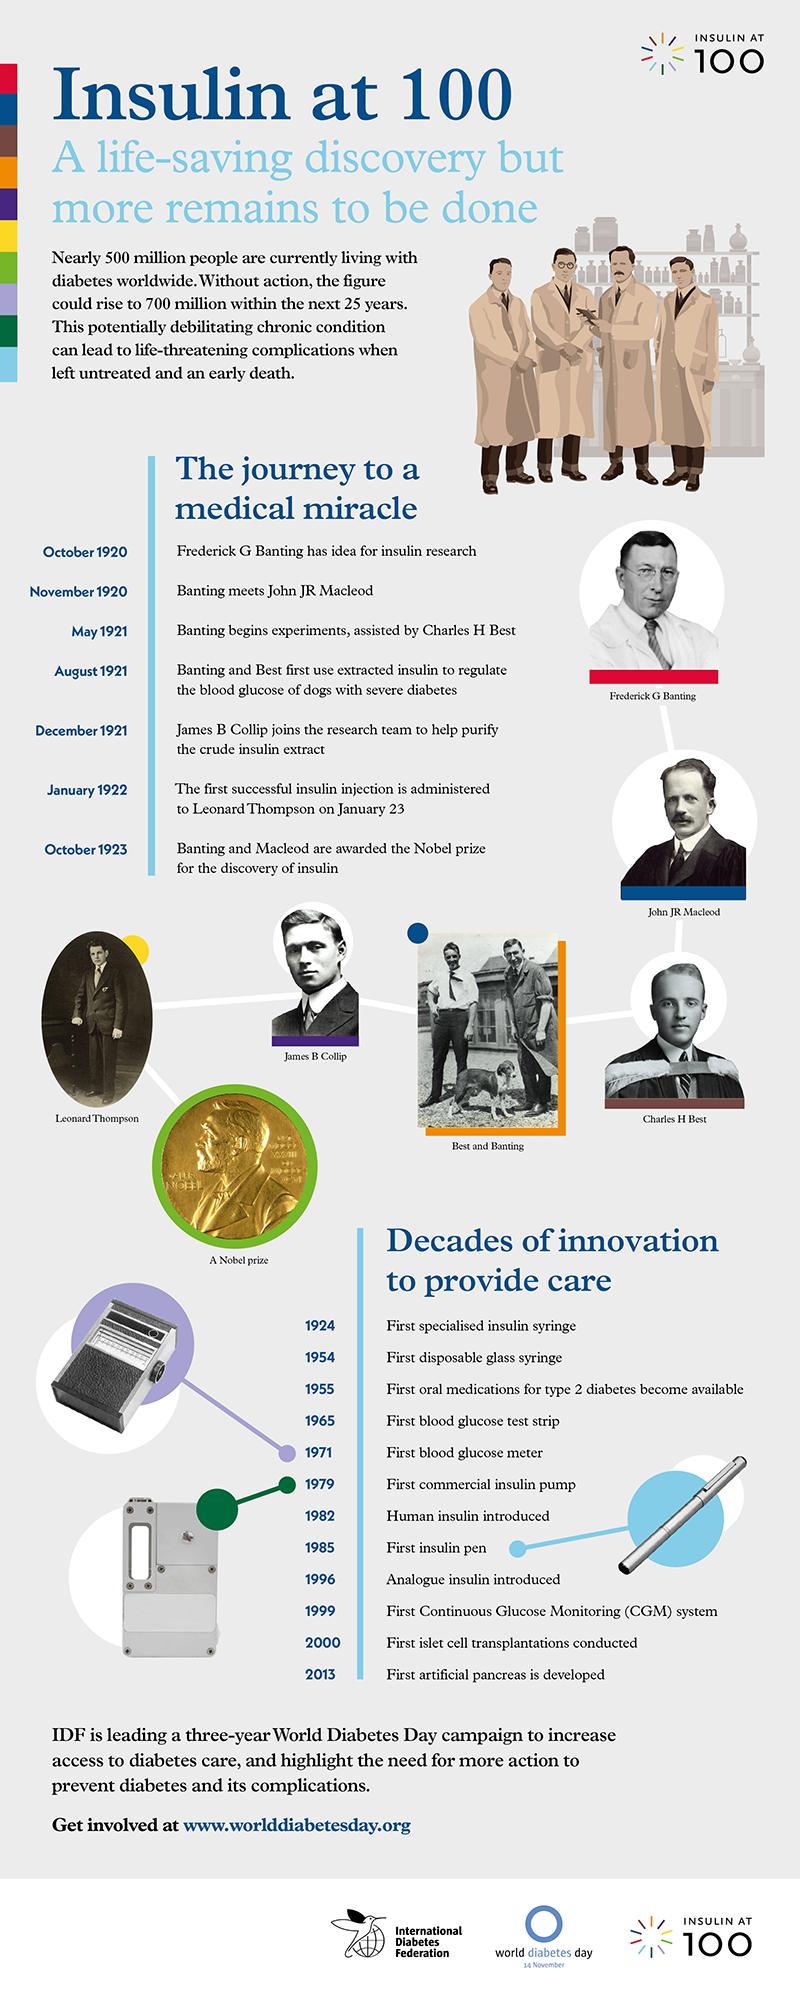 Insulin 100 infographic